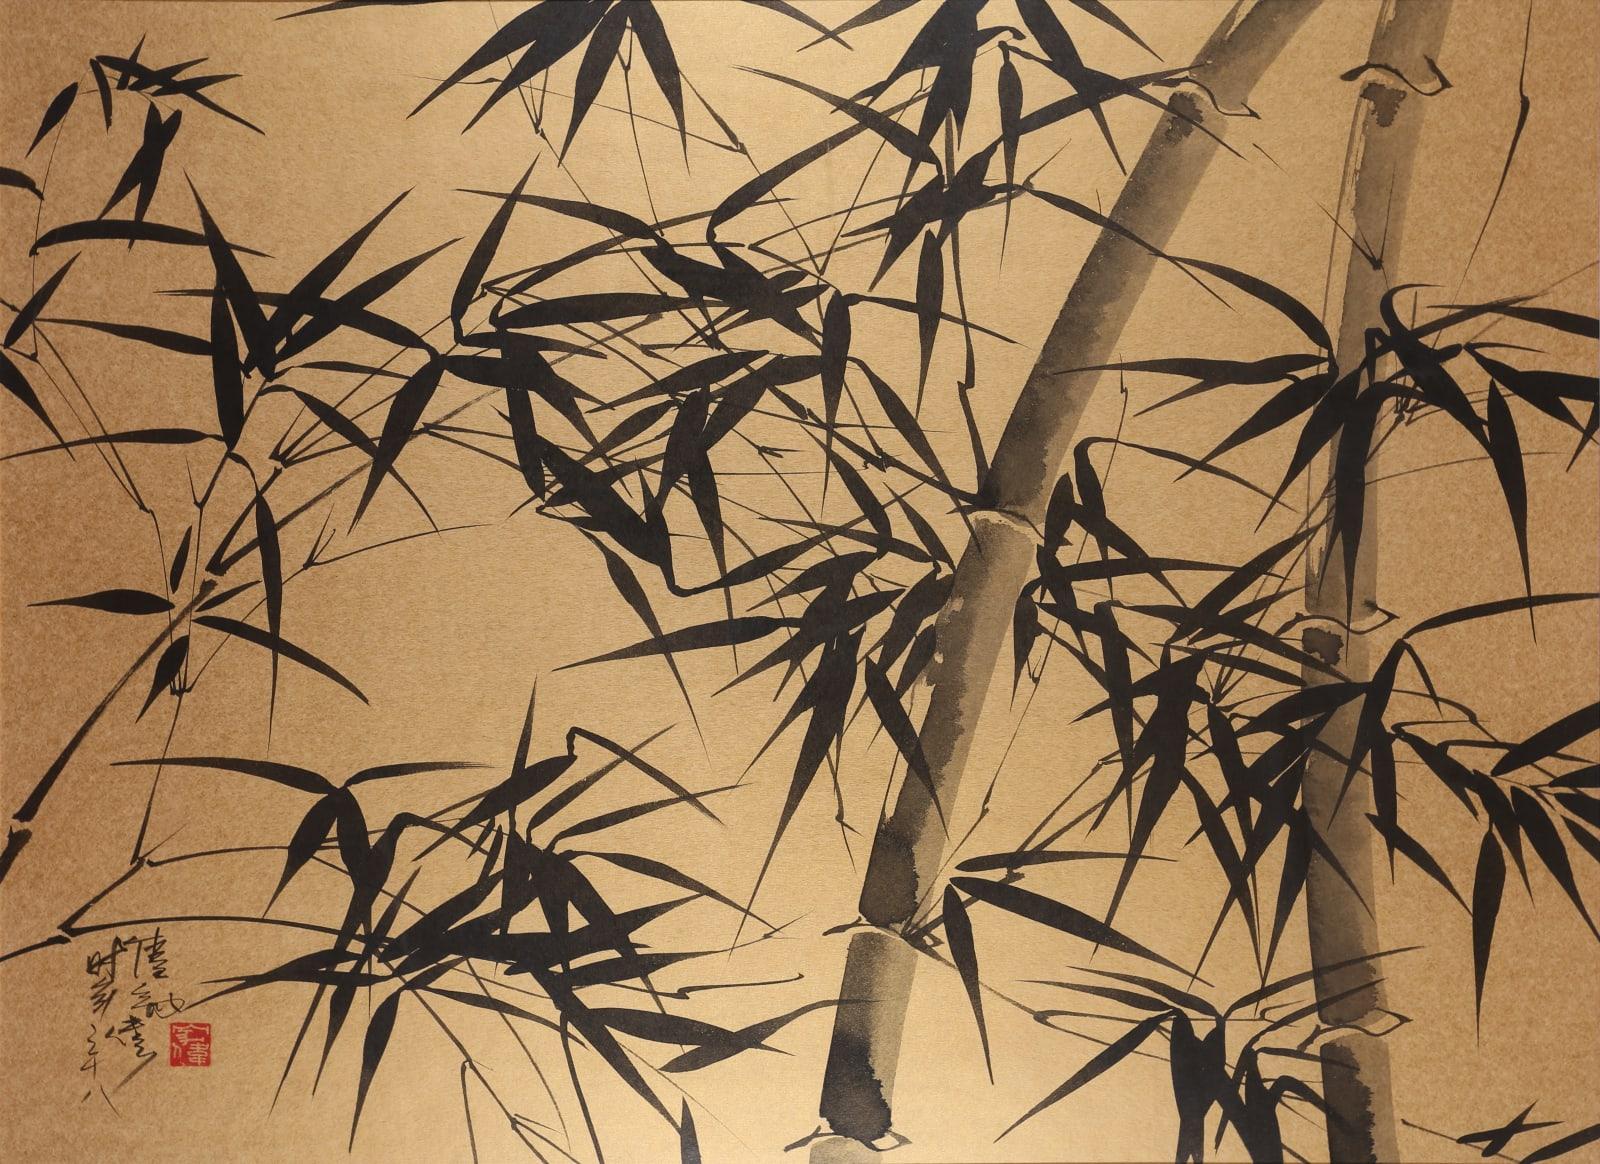 Wesley Tongson 唐家偉, Bamboo 竹 No. 59, 1995